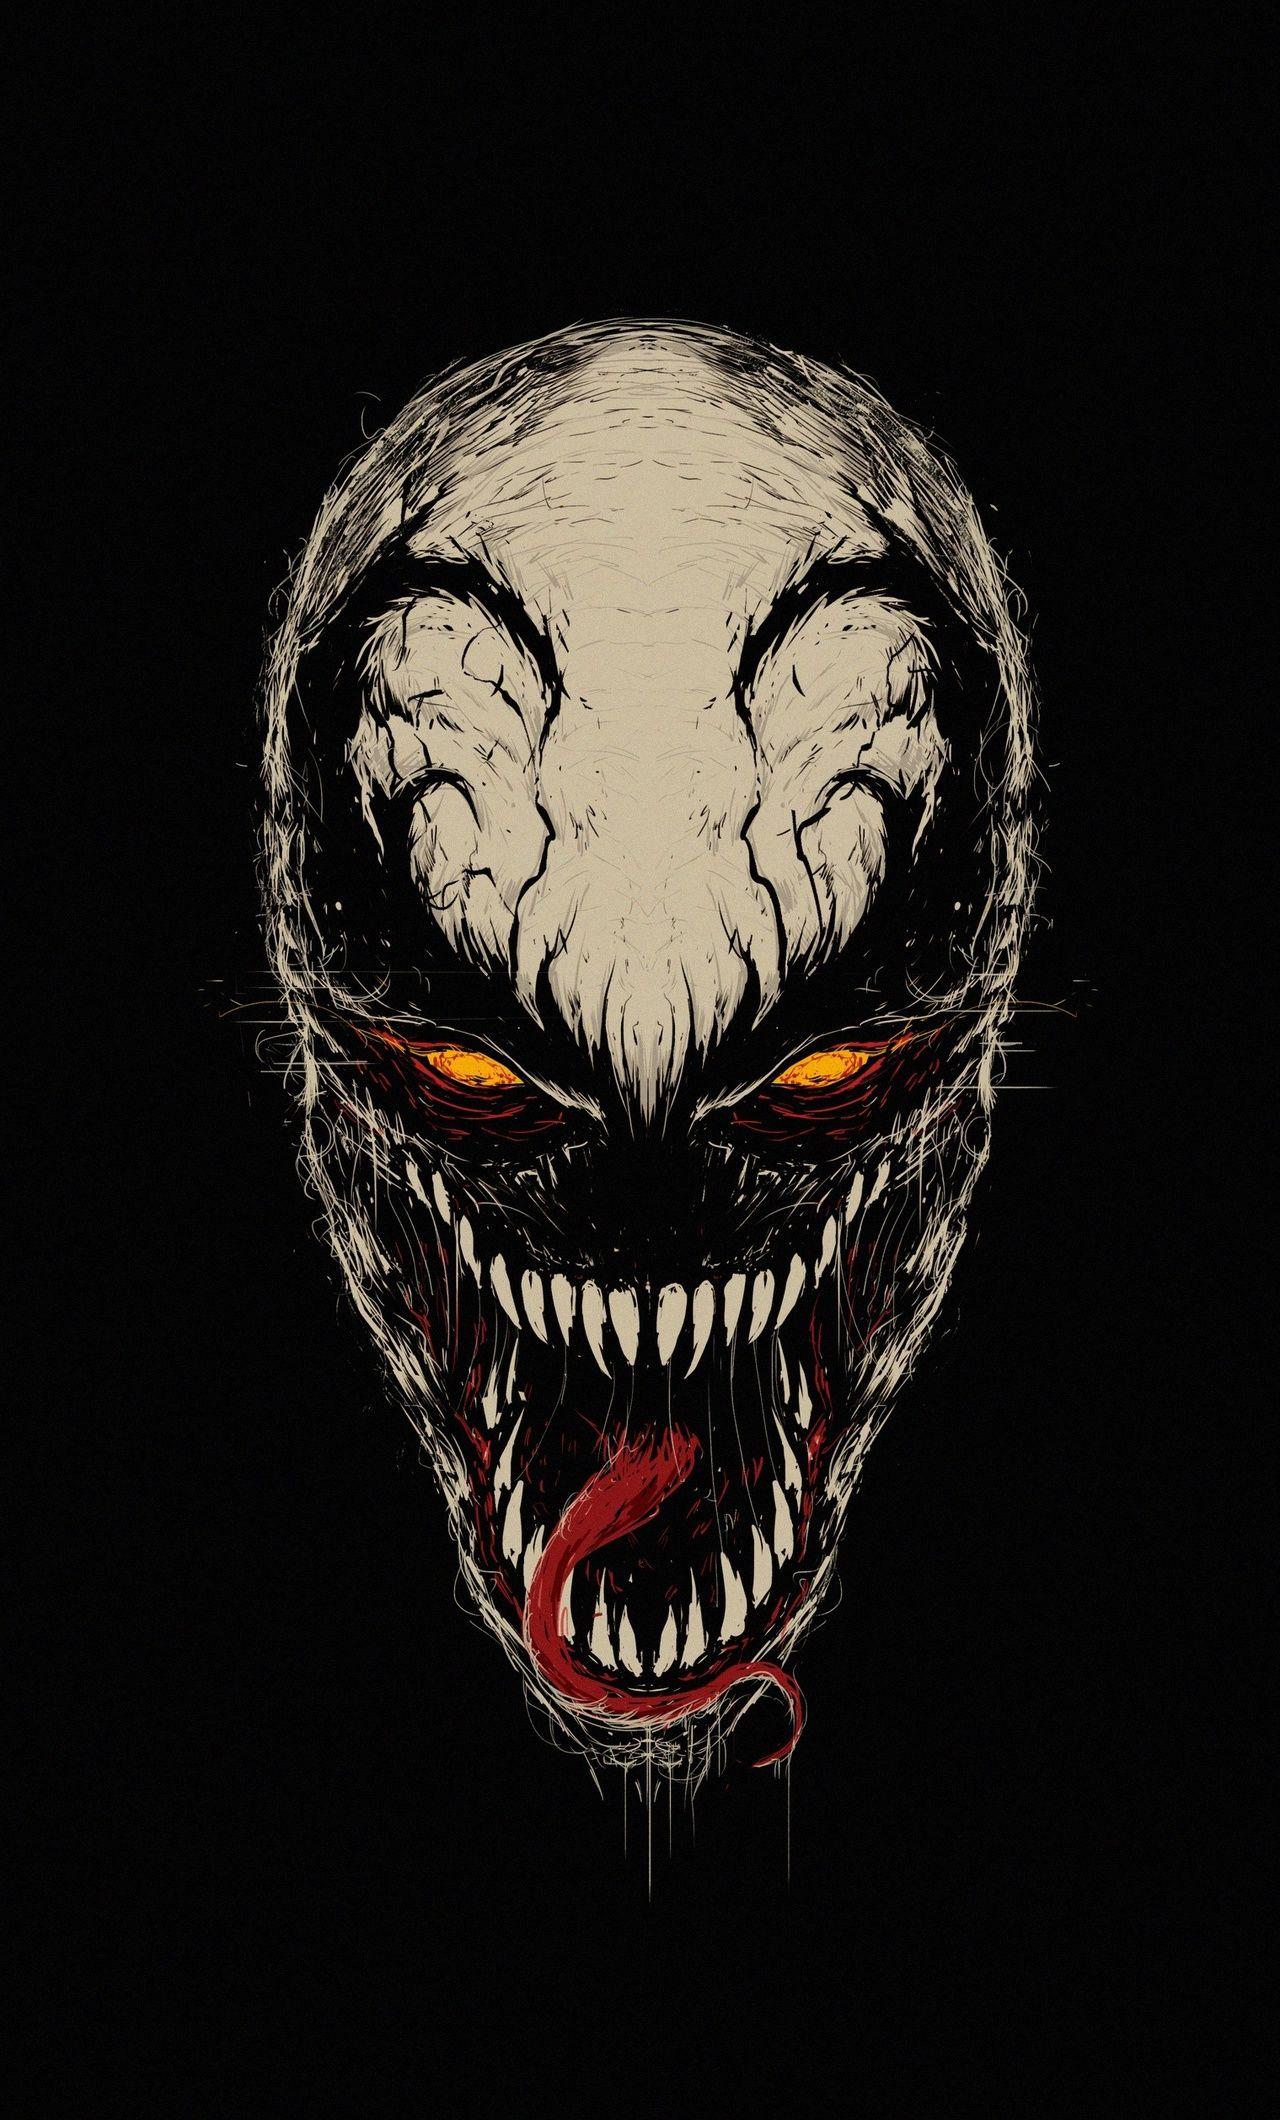 Venom iPhone 4k Wallpapers - Wallpaper Cave